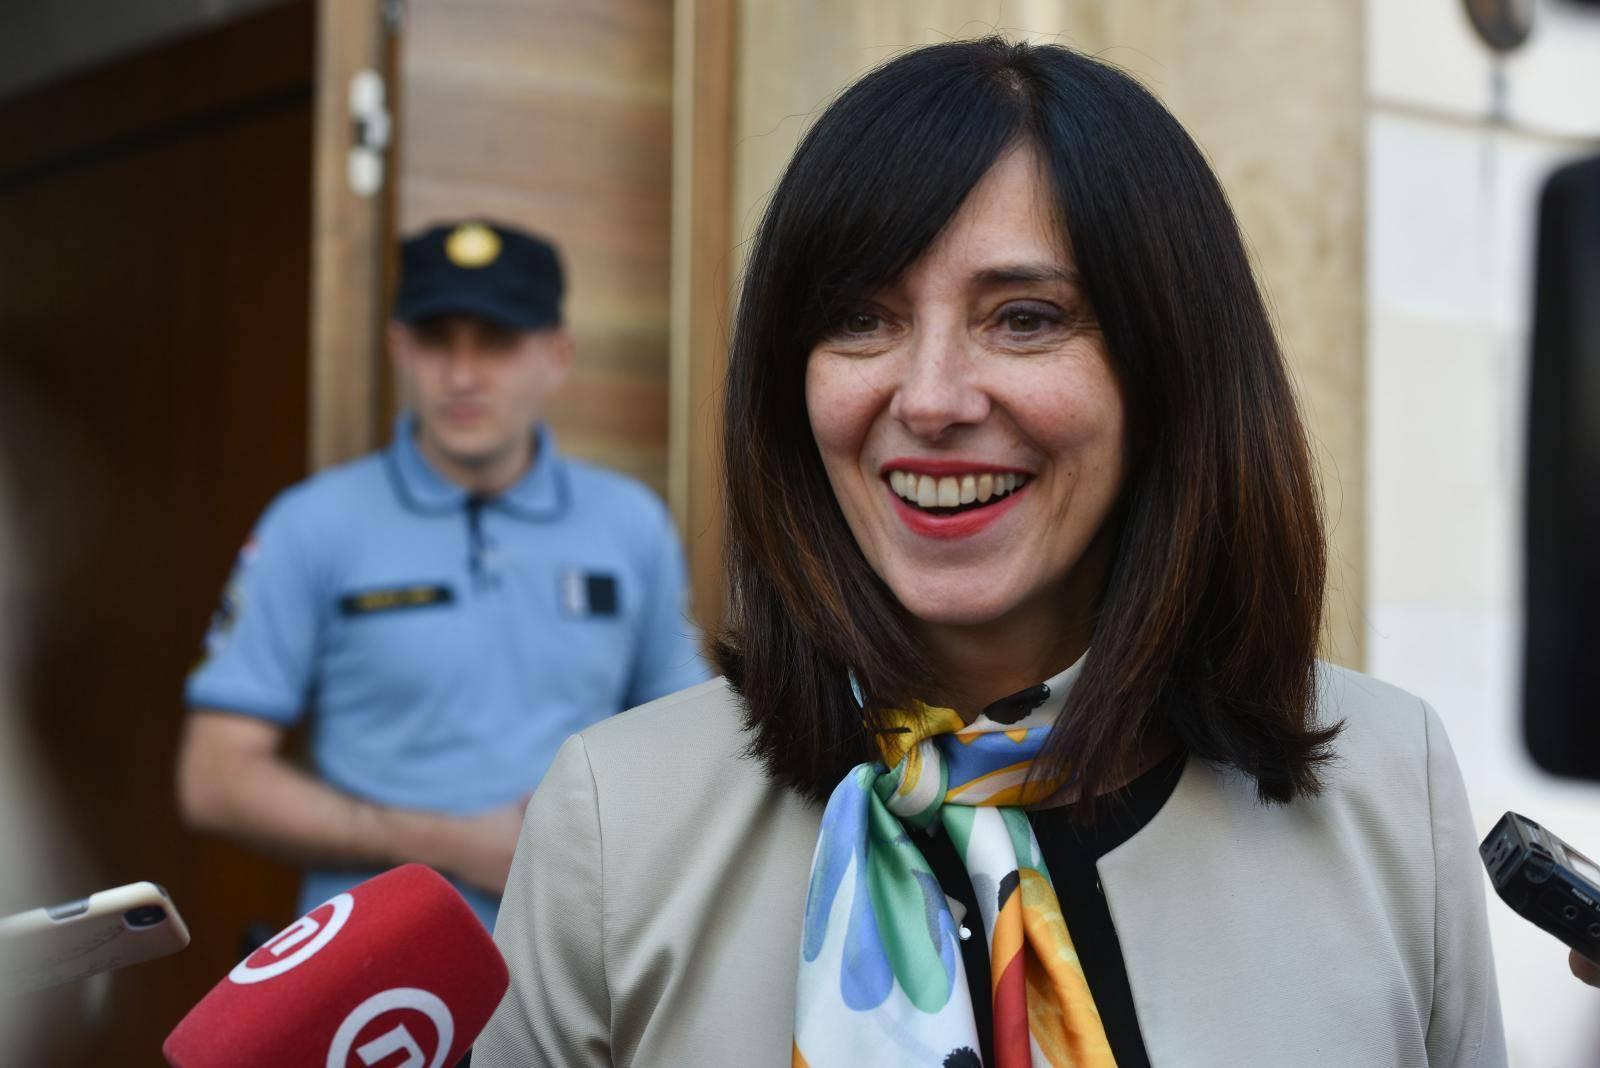 Zagreb: Izjava ministrice Divjak ispred Vlade